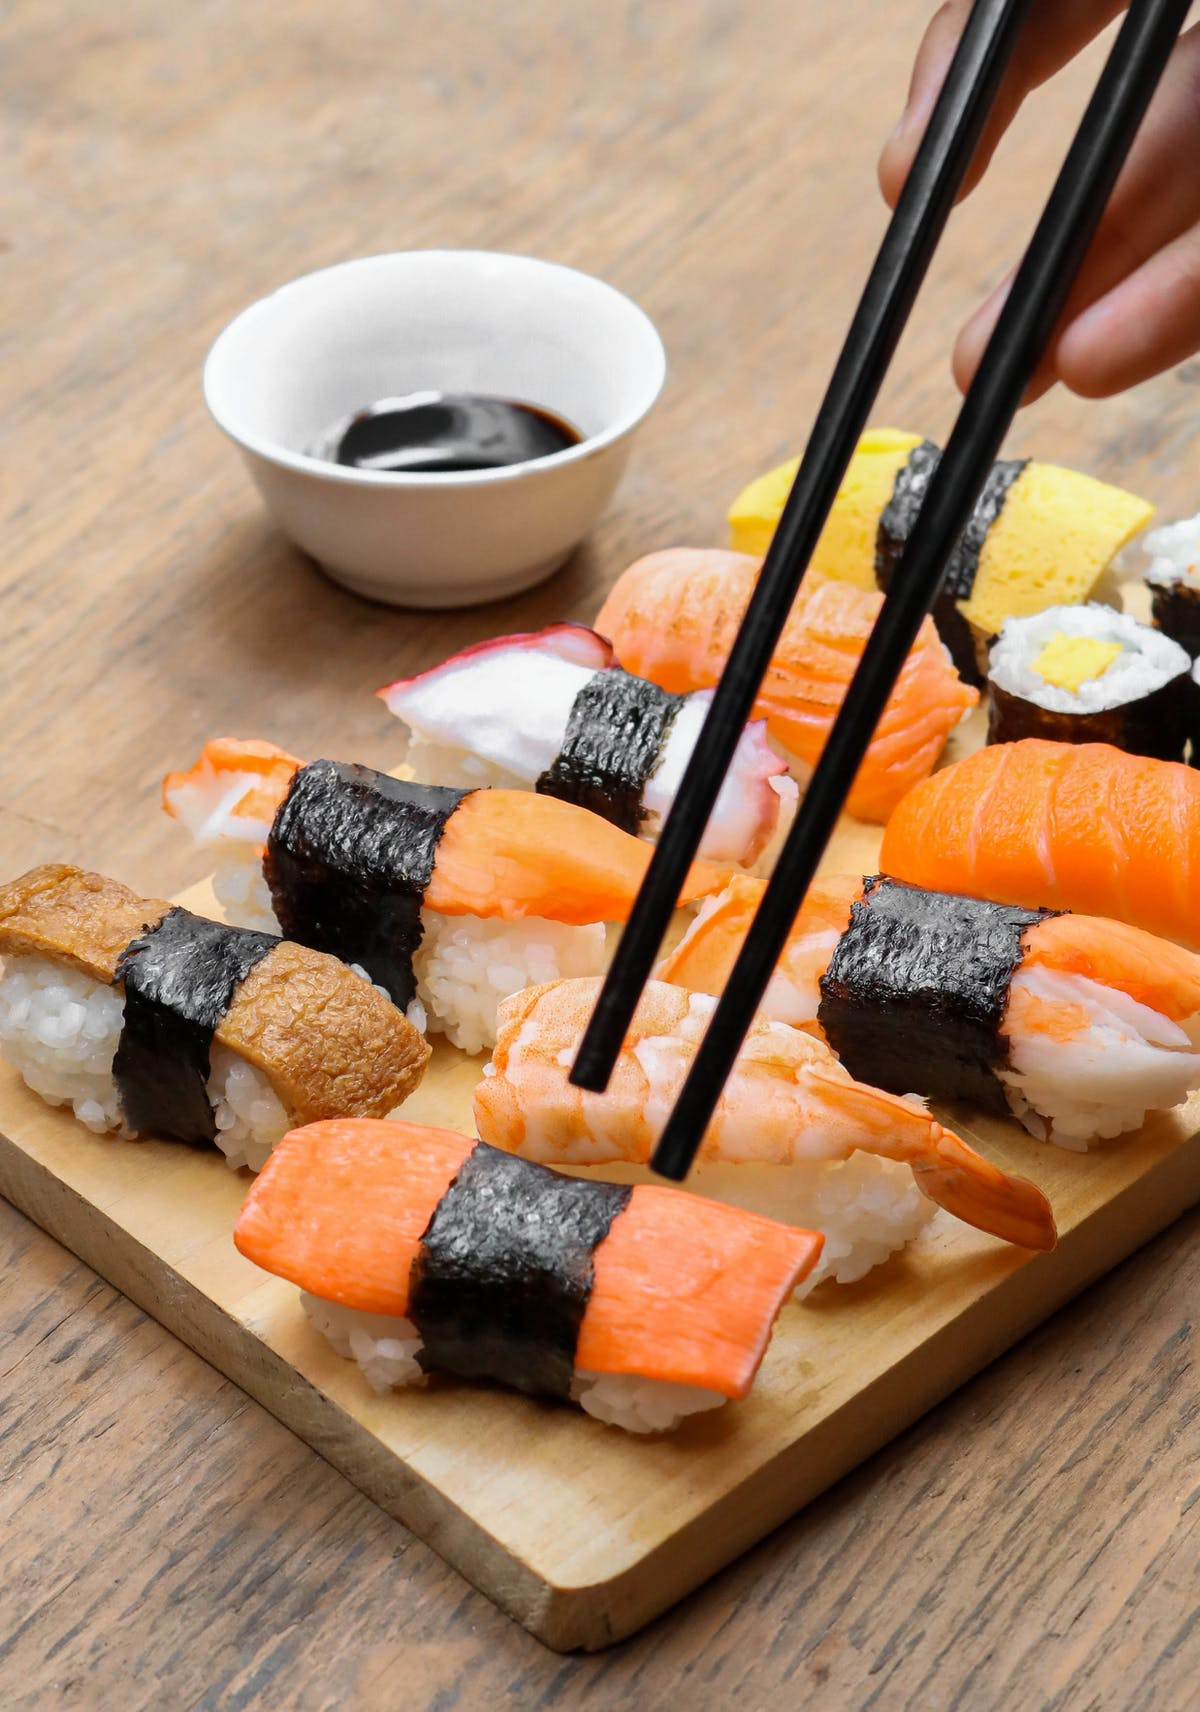 sushi on a wooden cutting board